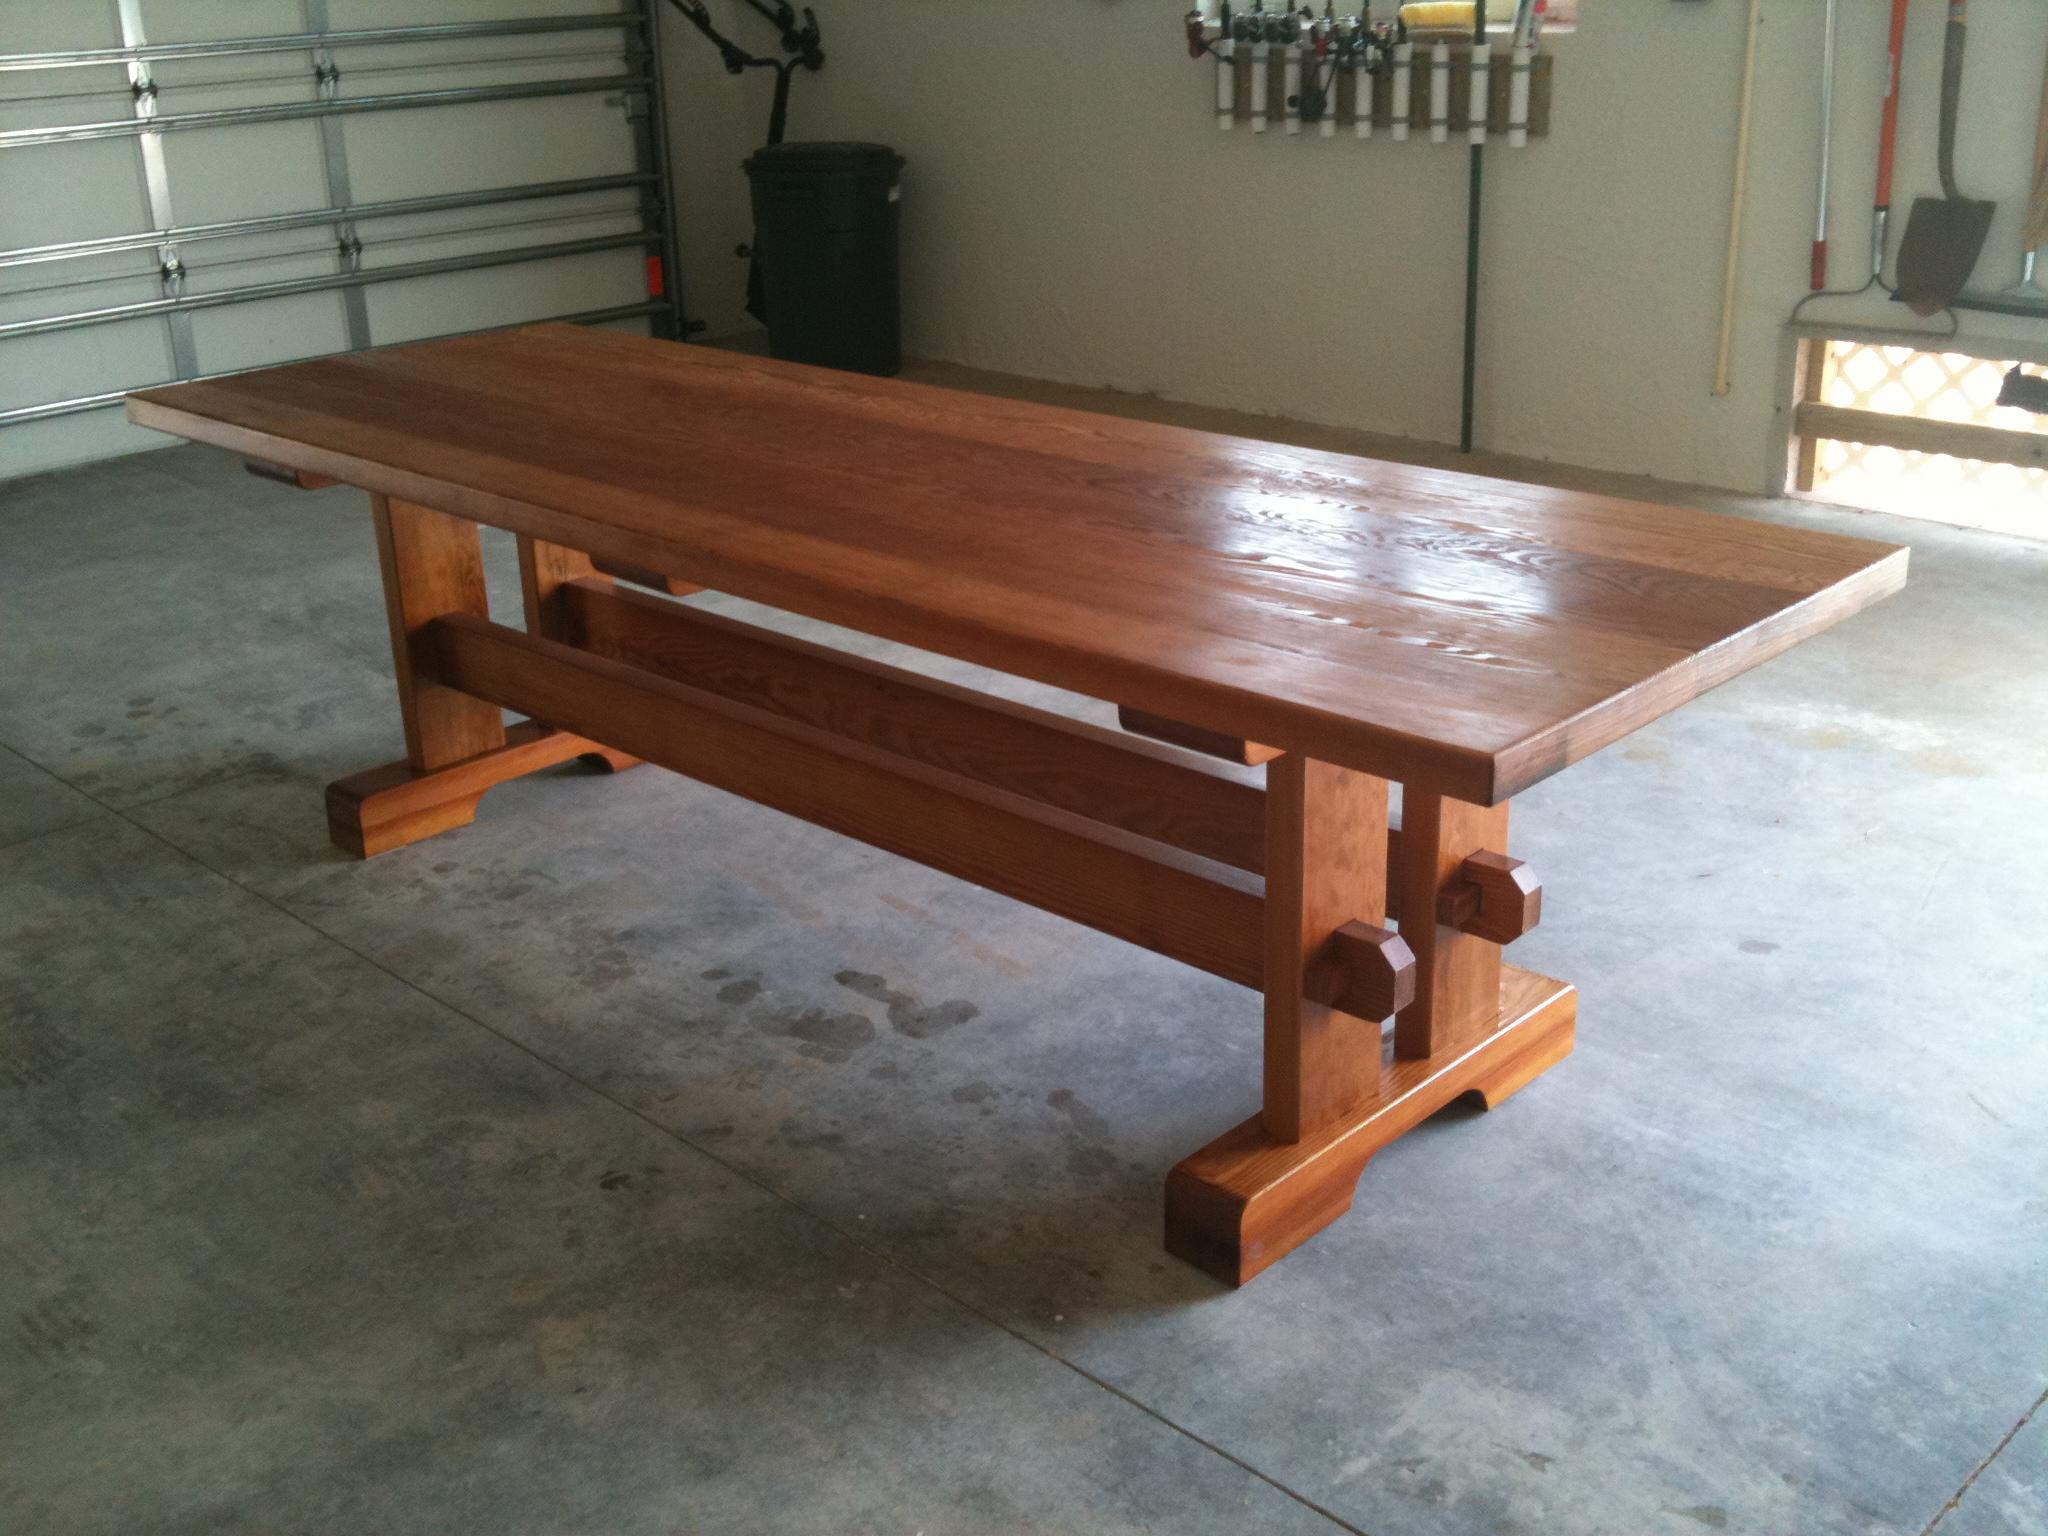 Scott's Table